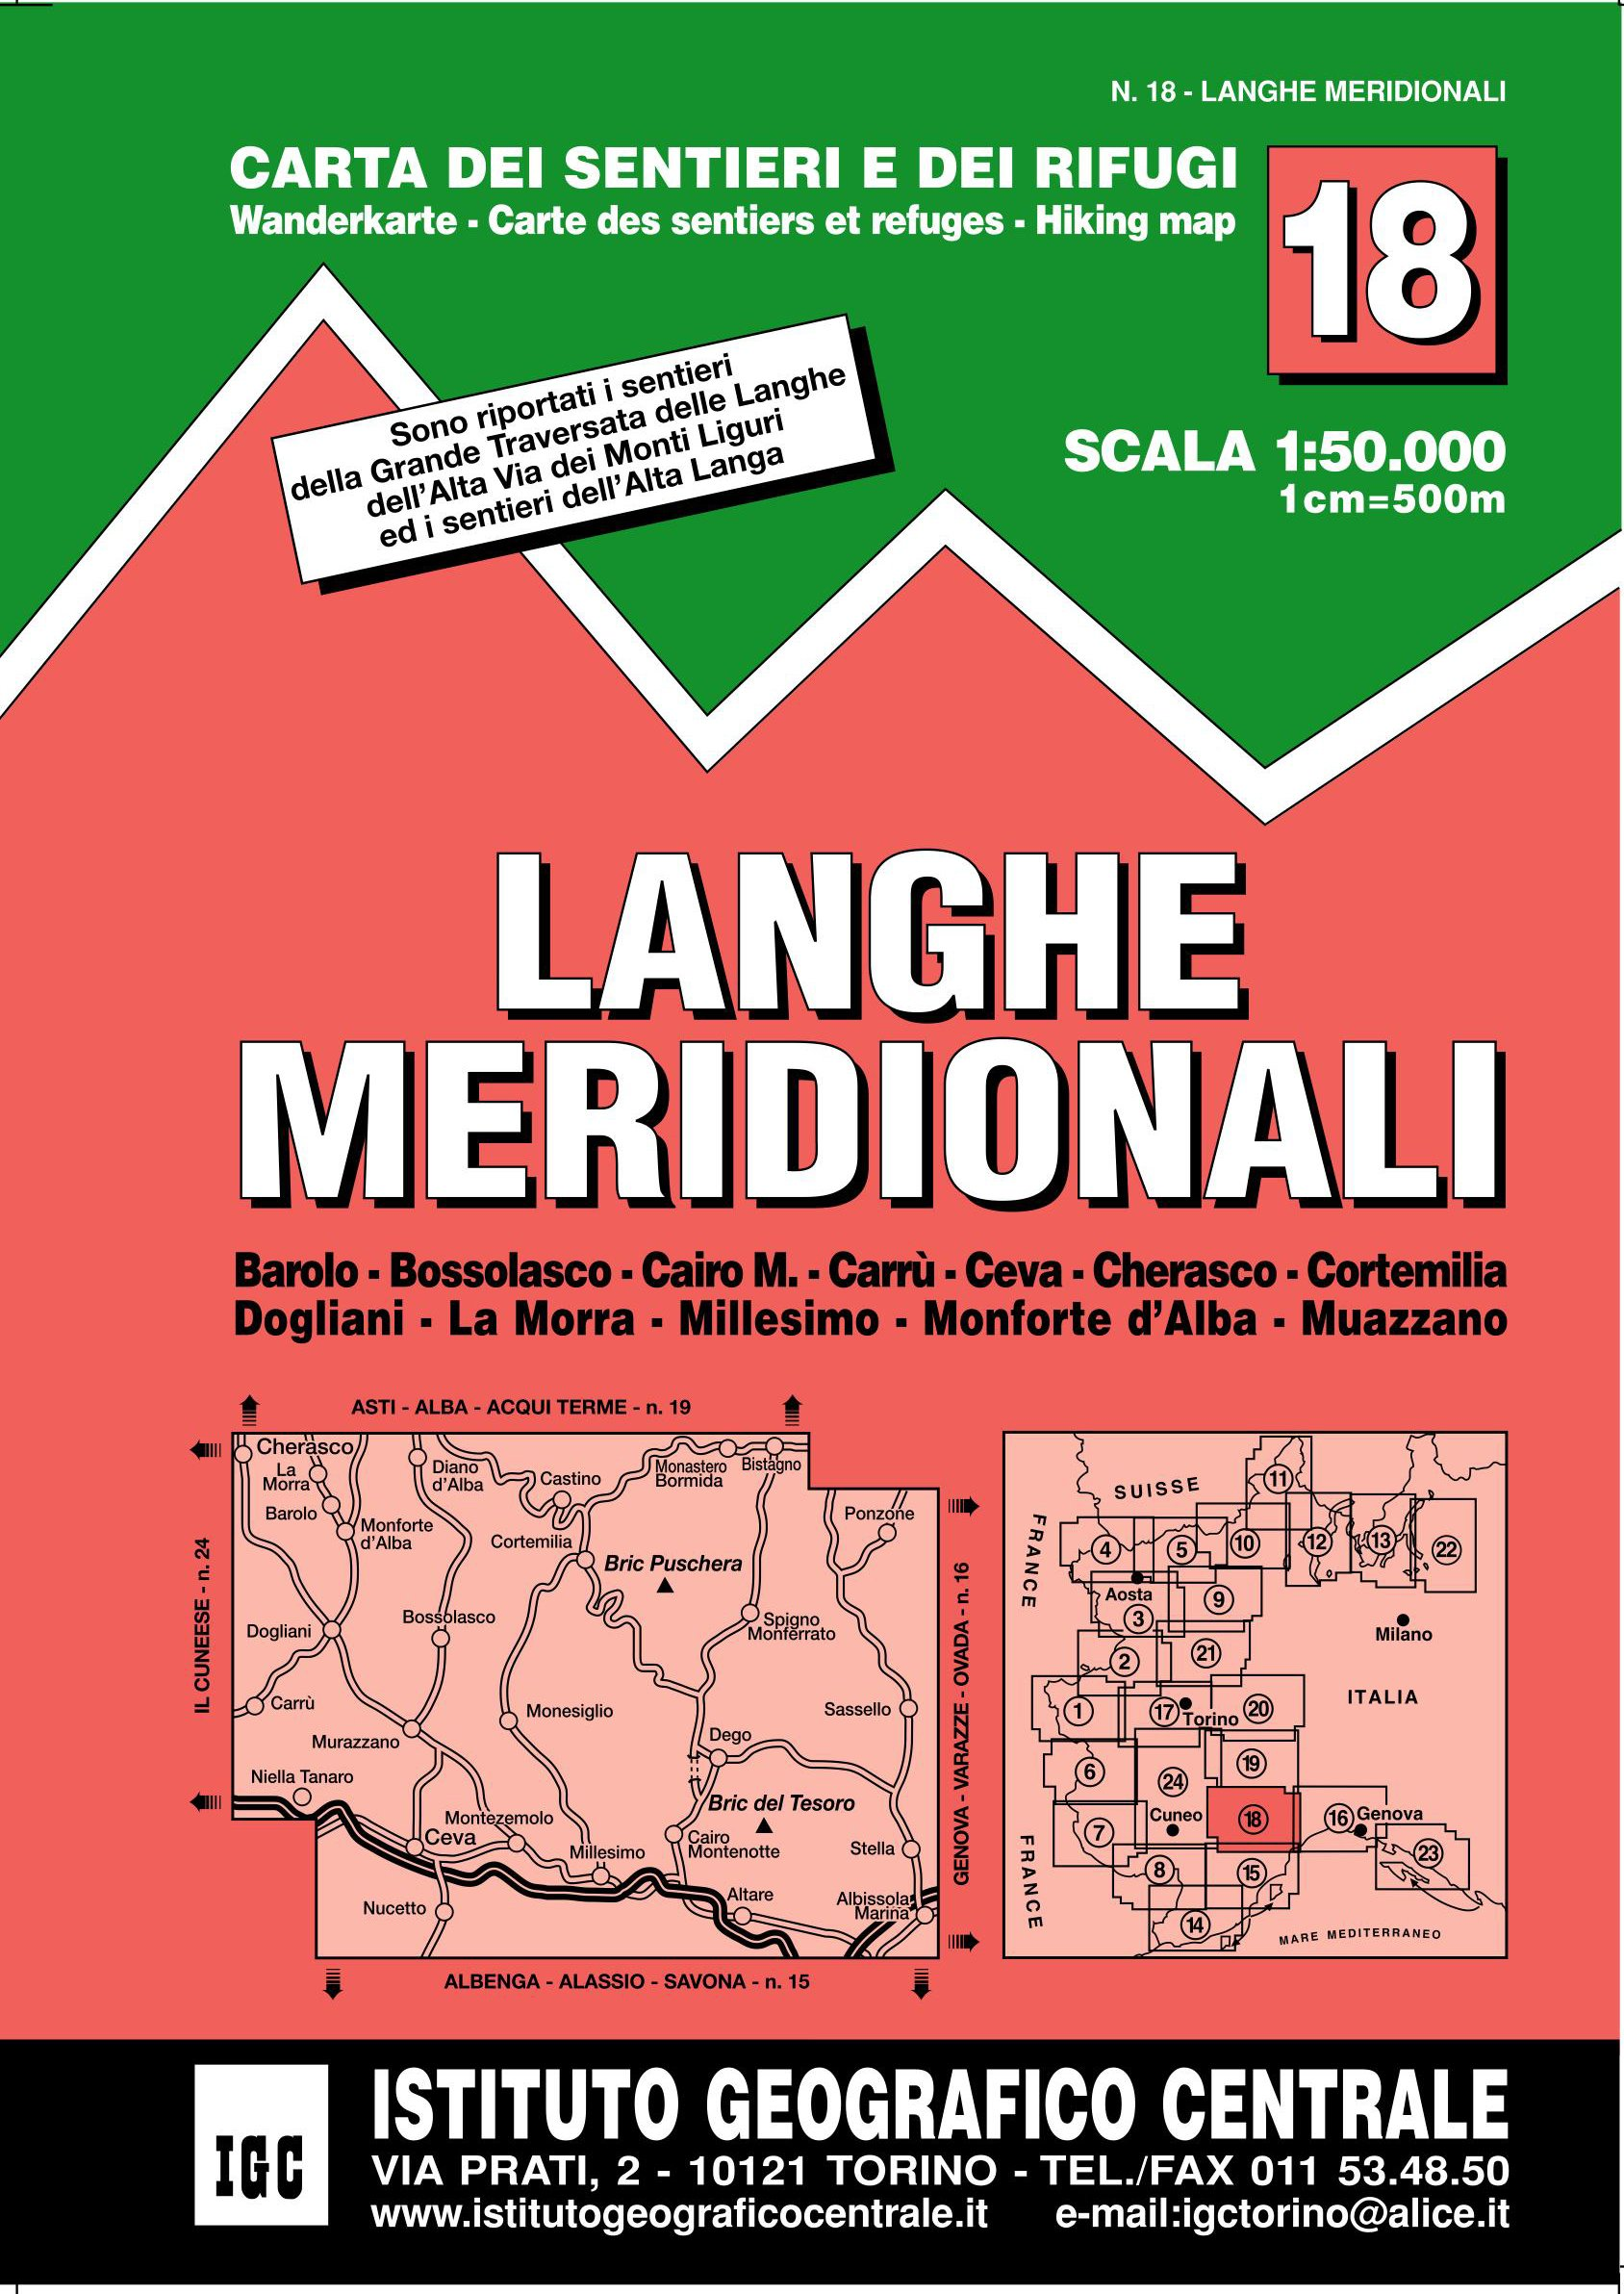 IGC Italien 1 : 50 000 Wanderkarte 18 Langhe Meridionali